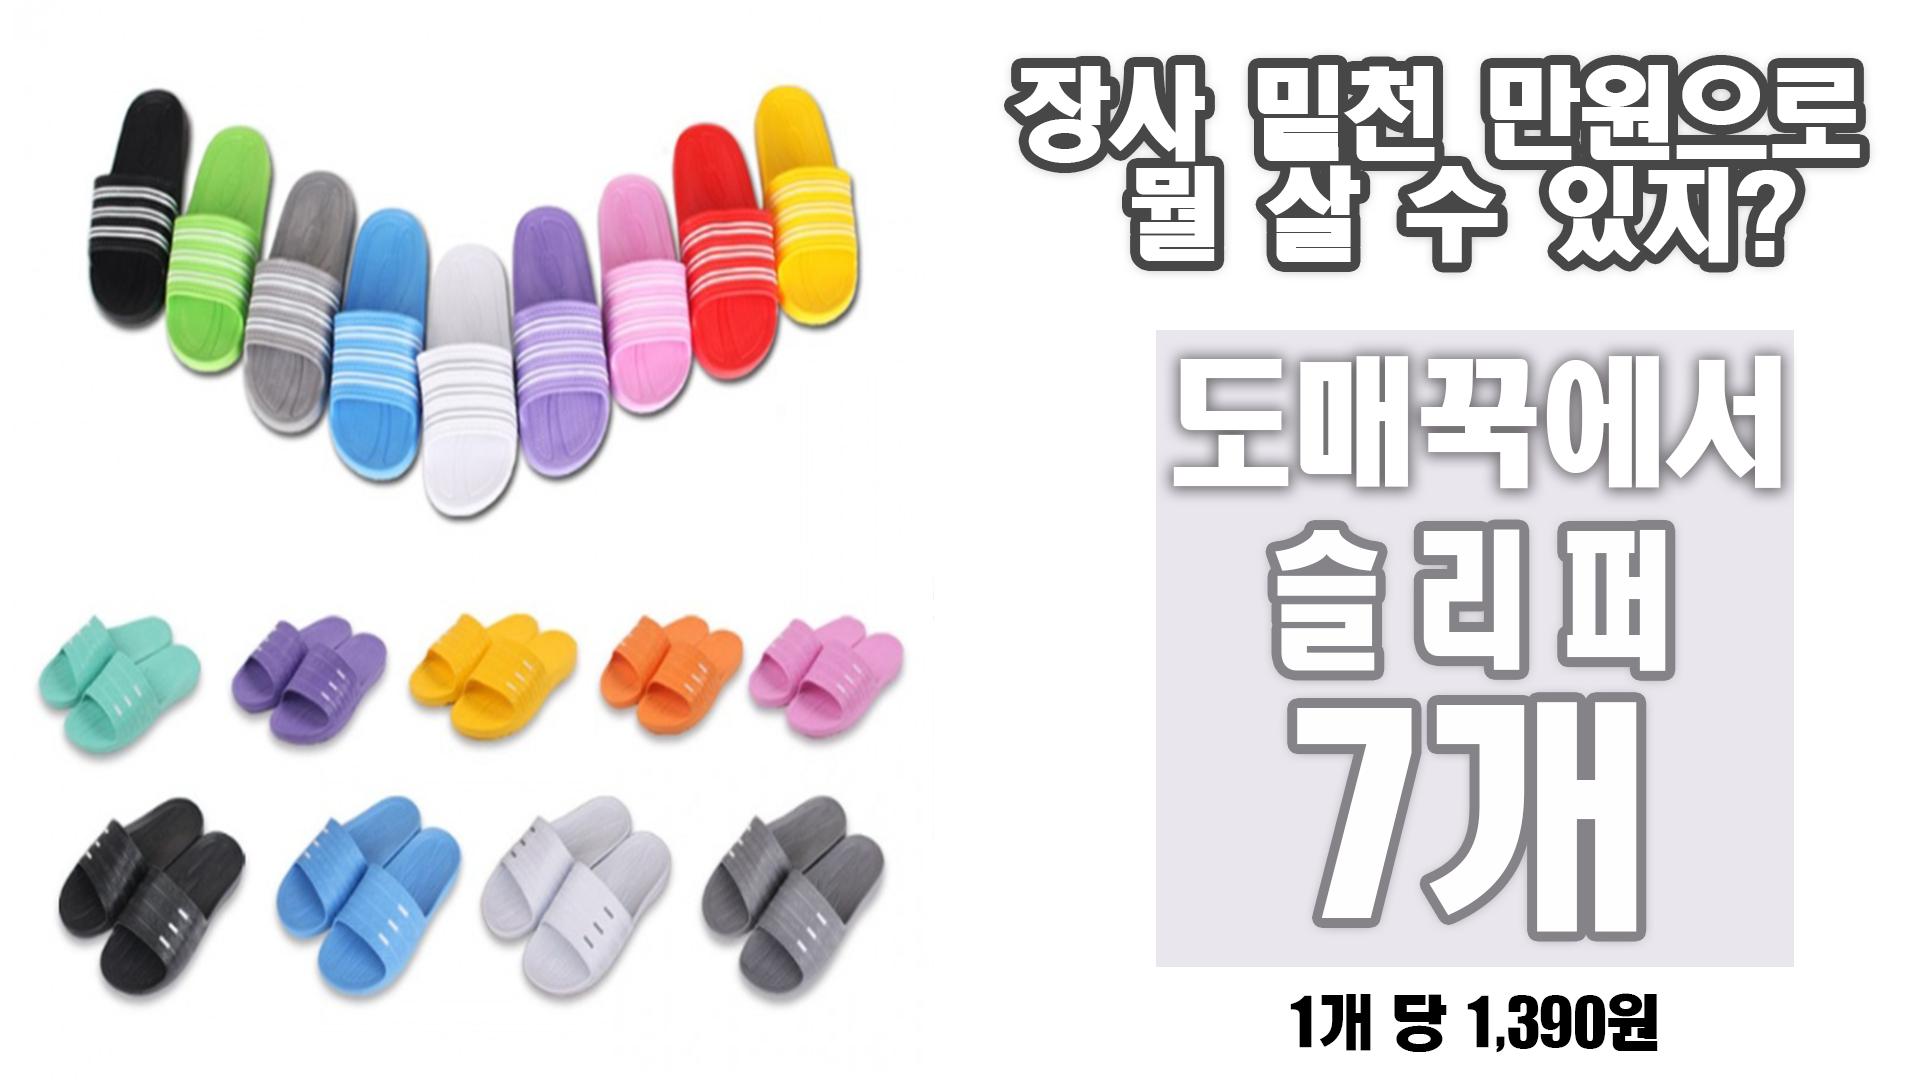 SM EVA 일체형 슬리퍼 2종 한정수량 도매가 이하 판매